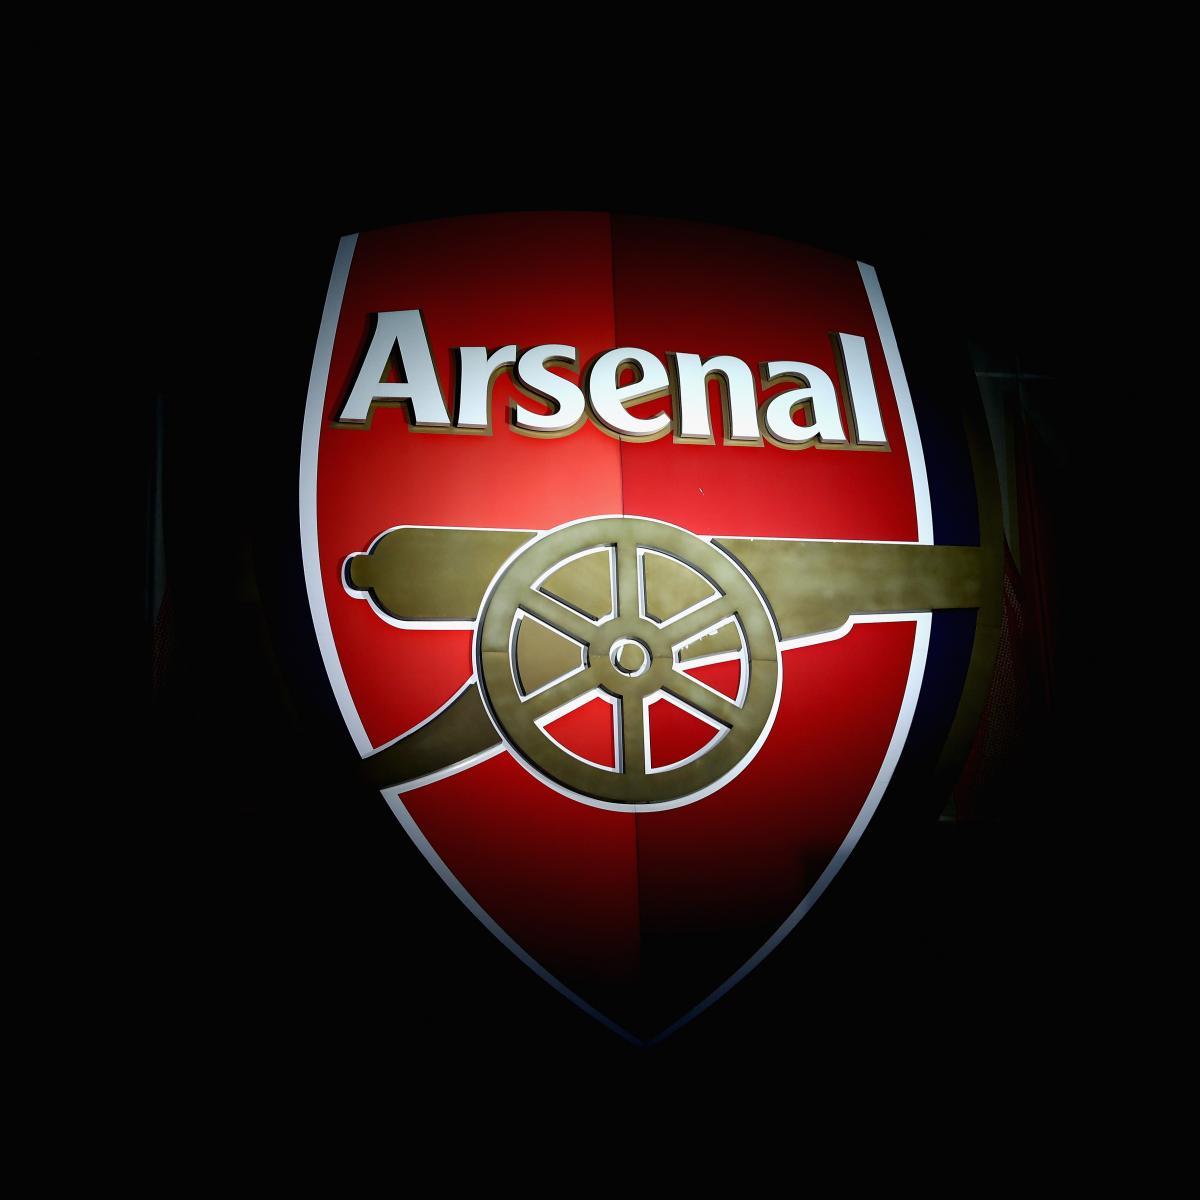 All Dream League Soccer 2019 Arsenal FC Kits & Logos URL ...  |Arsenal